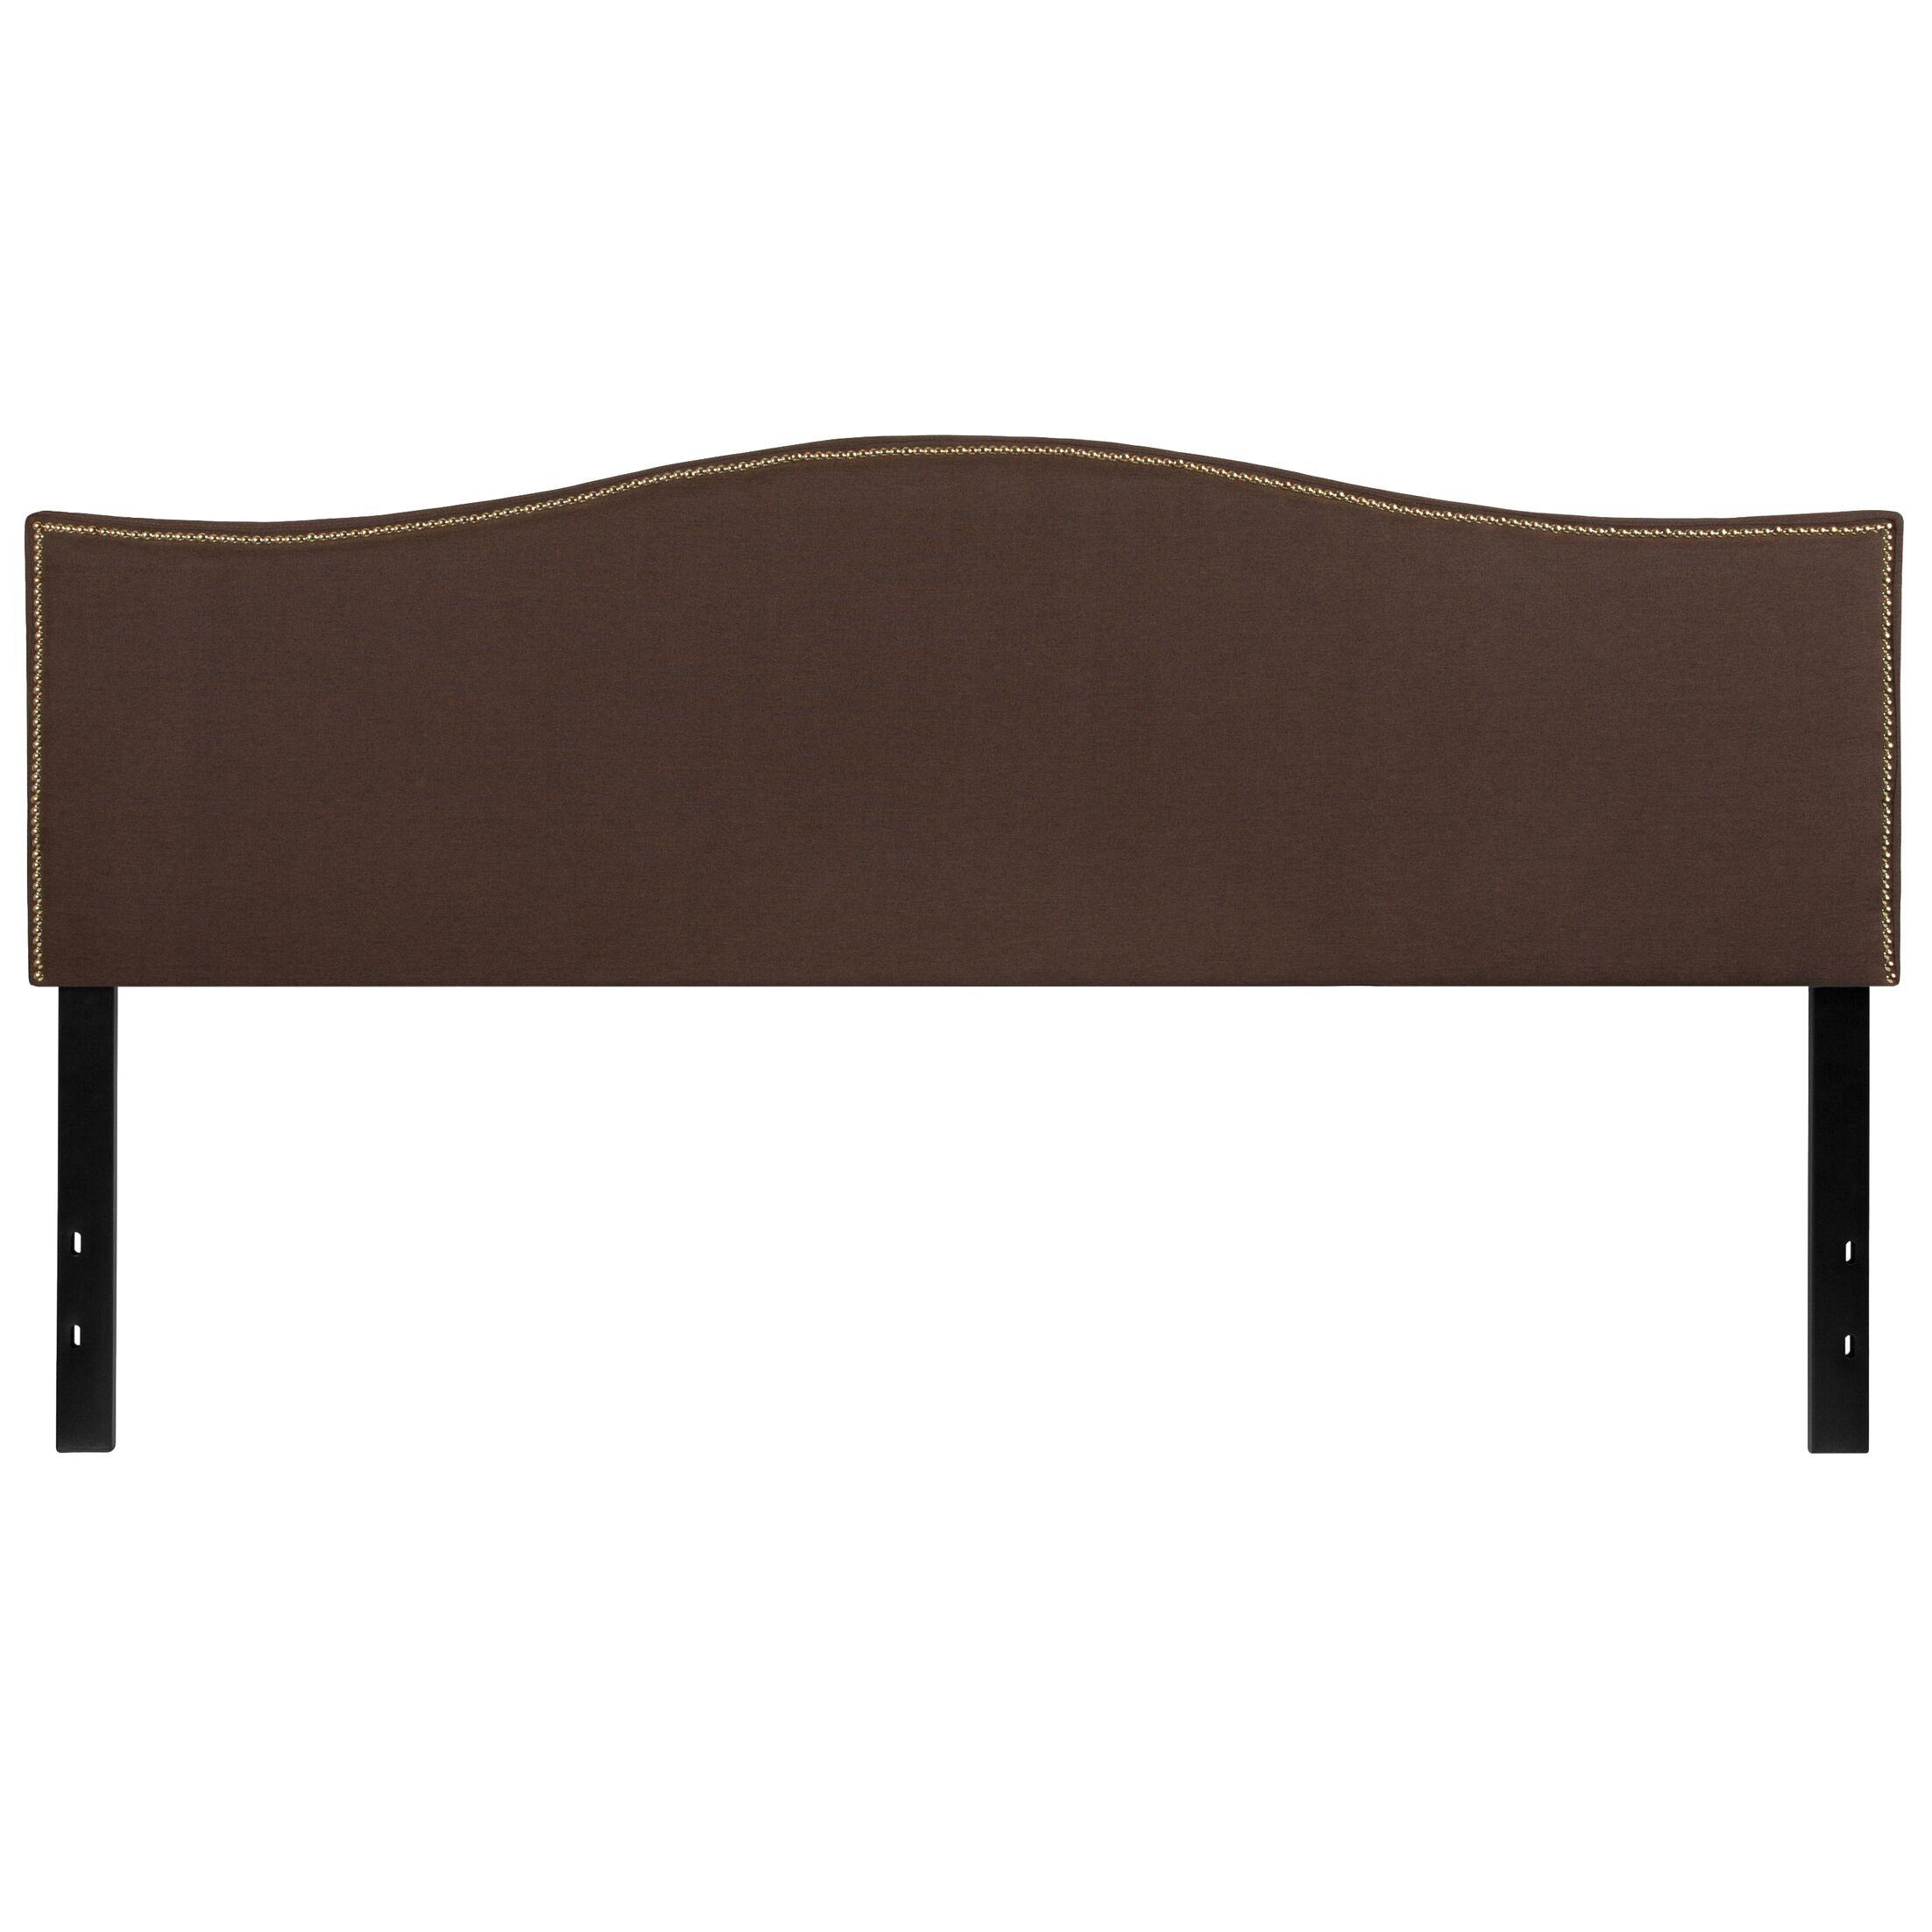 Fitzsimmons Upholstered Panel Headboard Upholstery: Dark Brown, Size: King